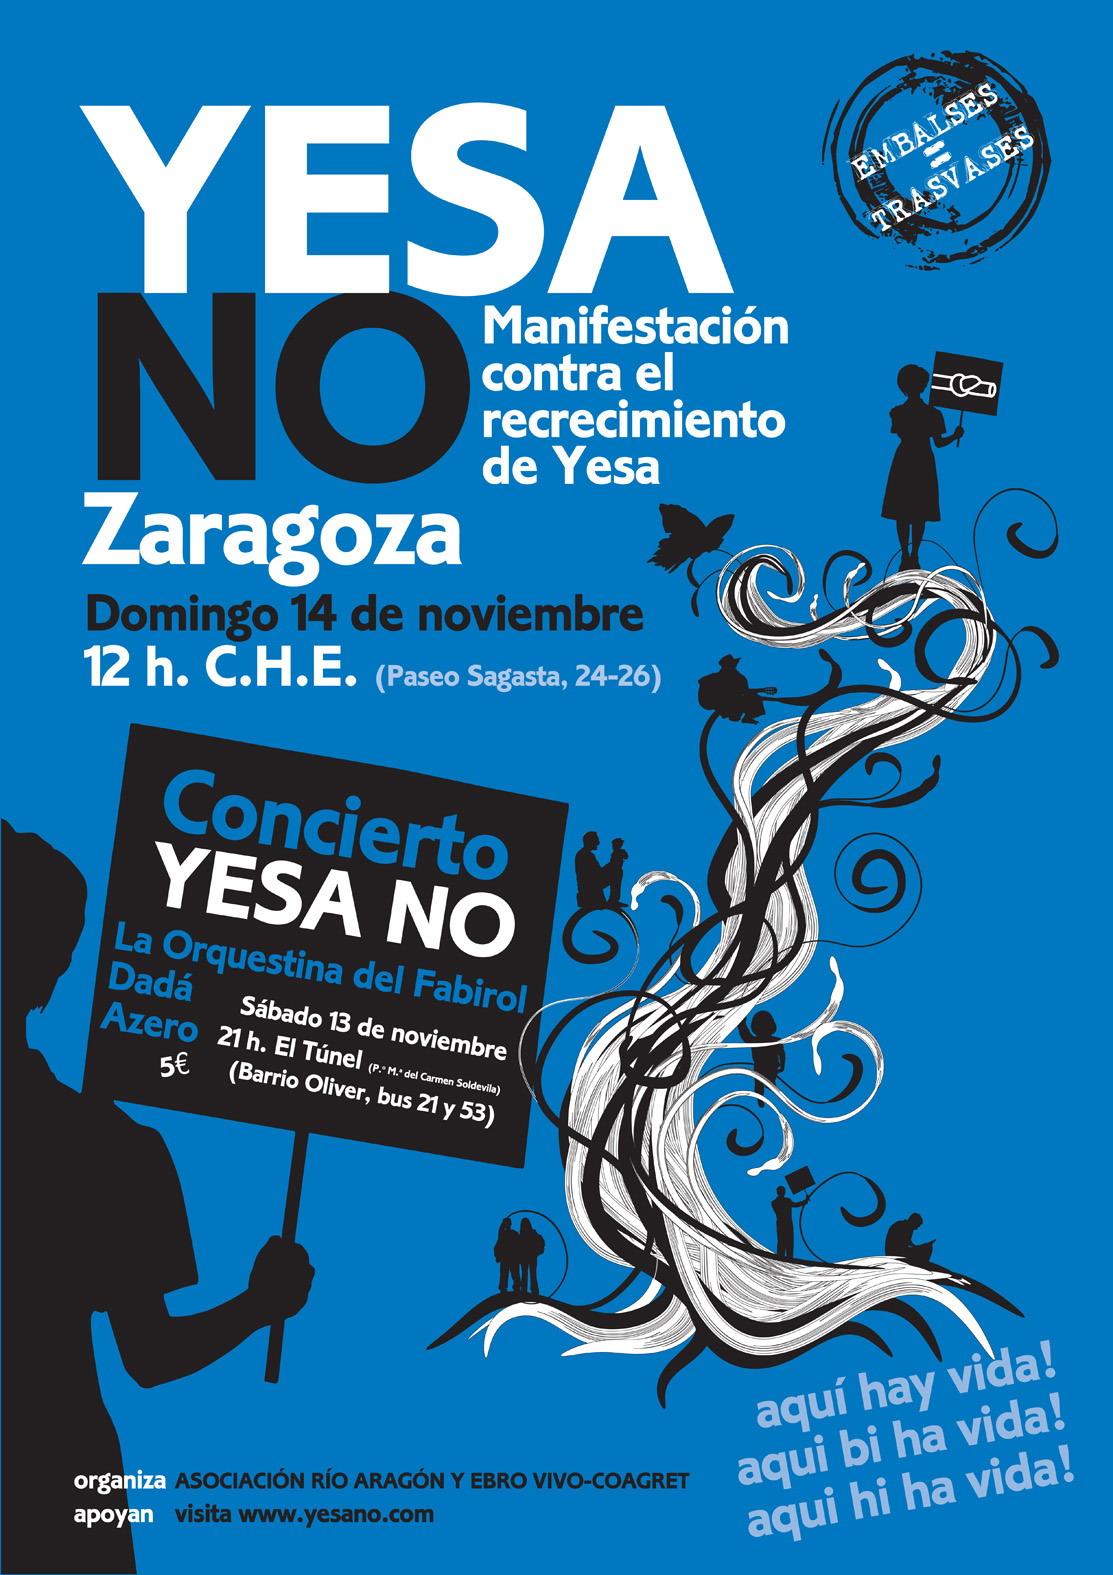 No al recrecimiento de Yesa - Manifestacion 14 noviembre 2010 - 12h. C.H.E. Zaragoza